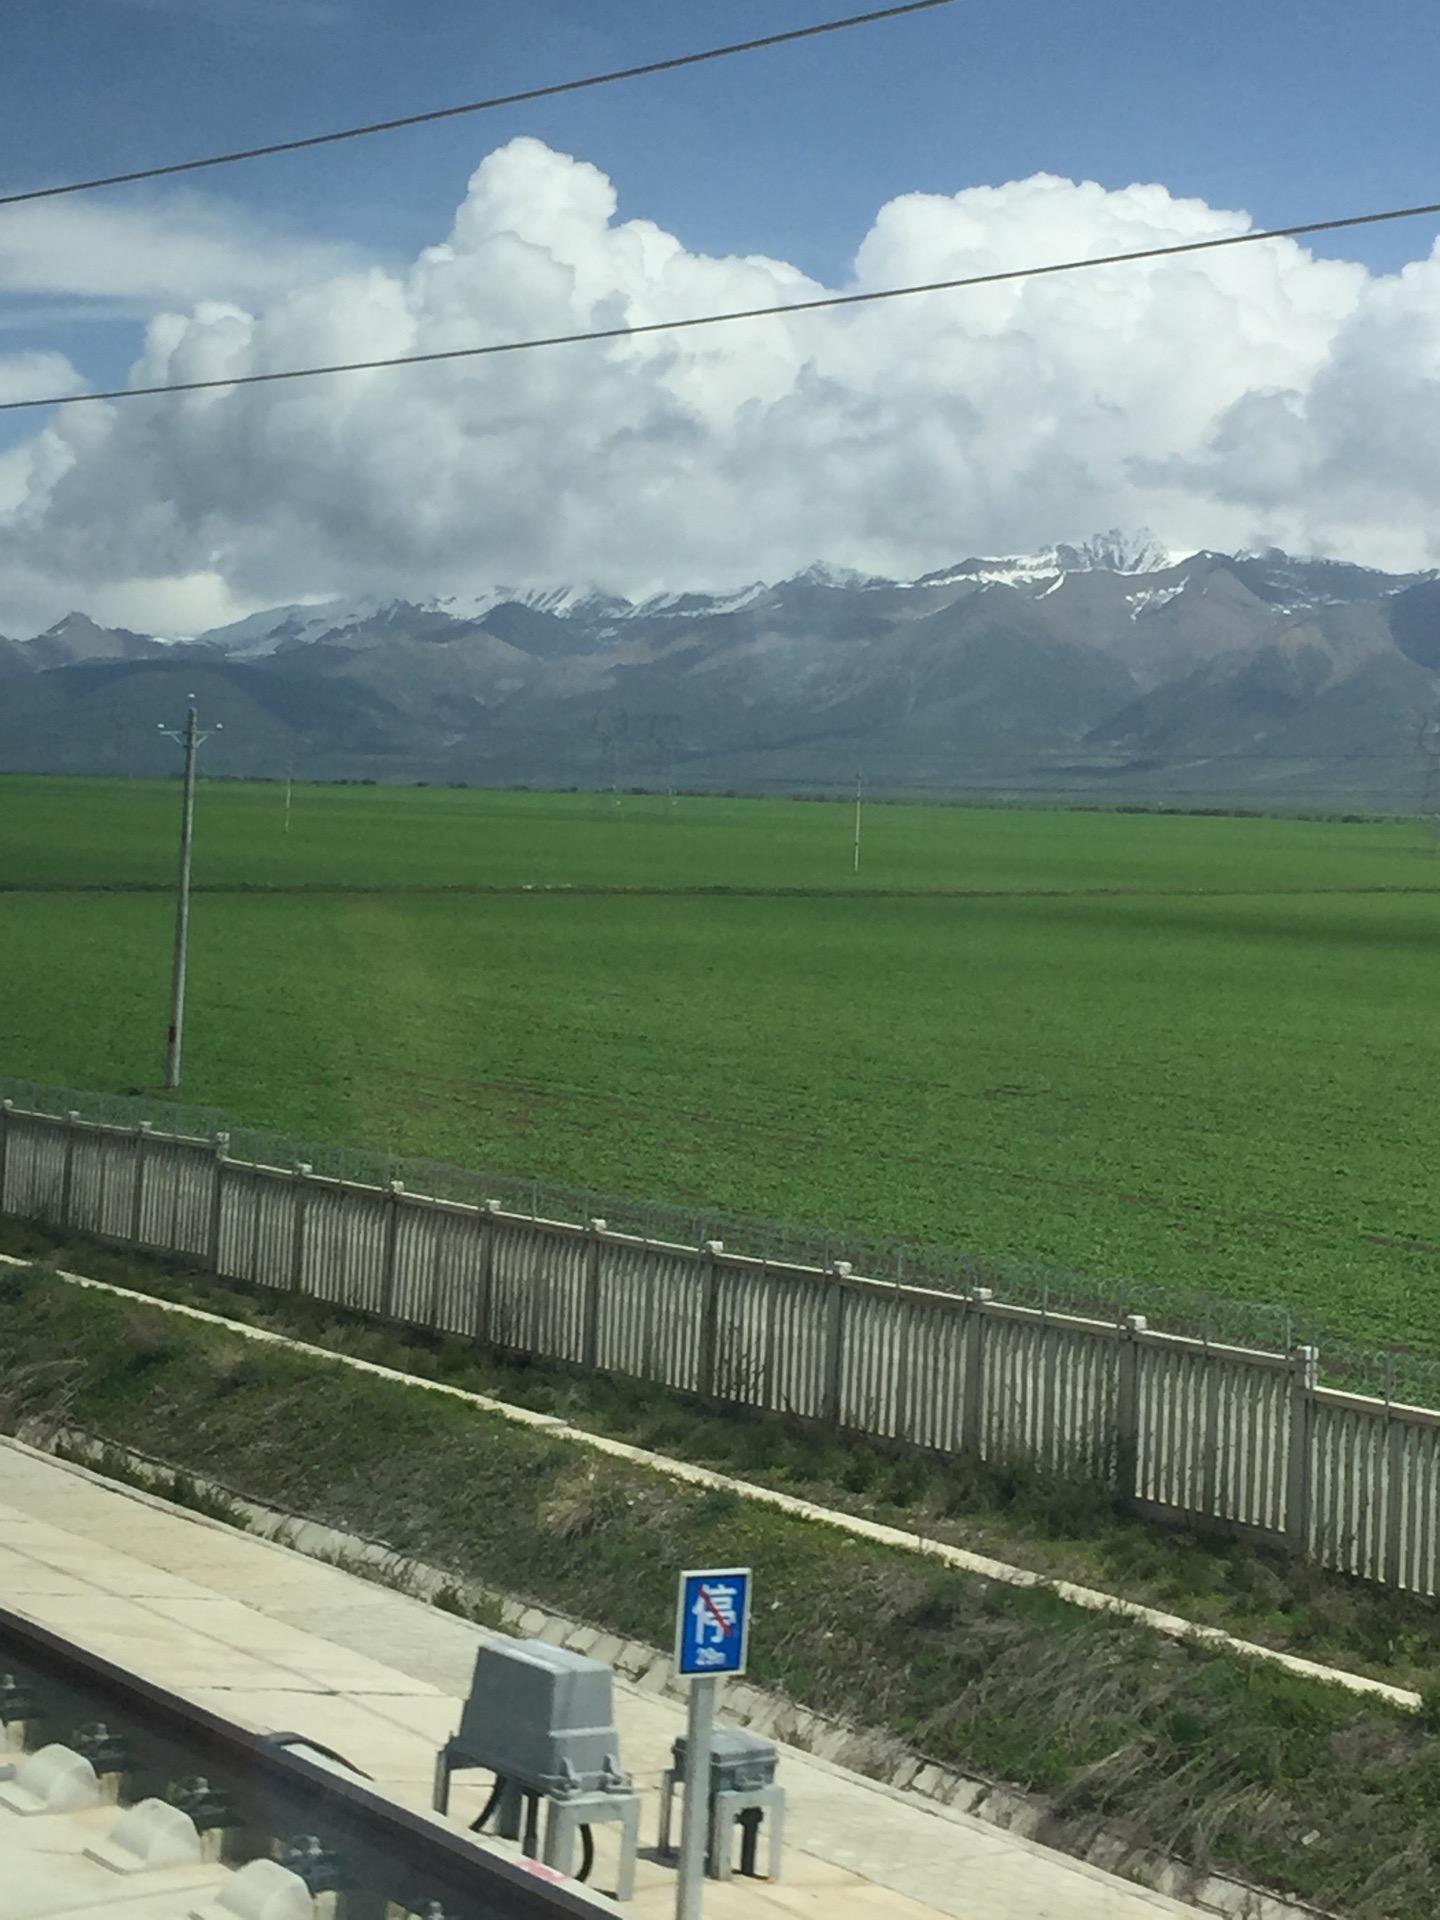 Biandoukou Ski Field